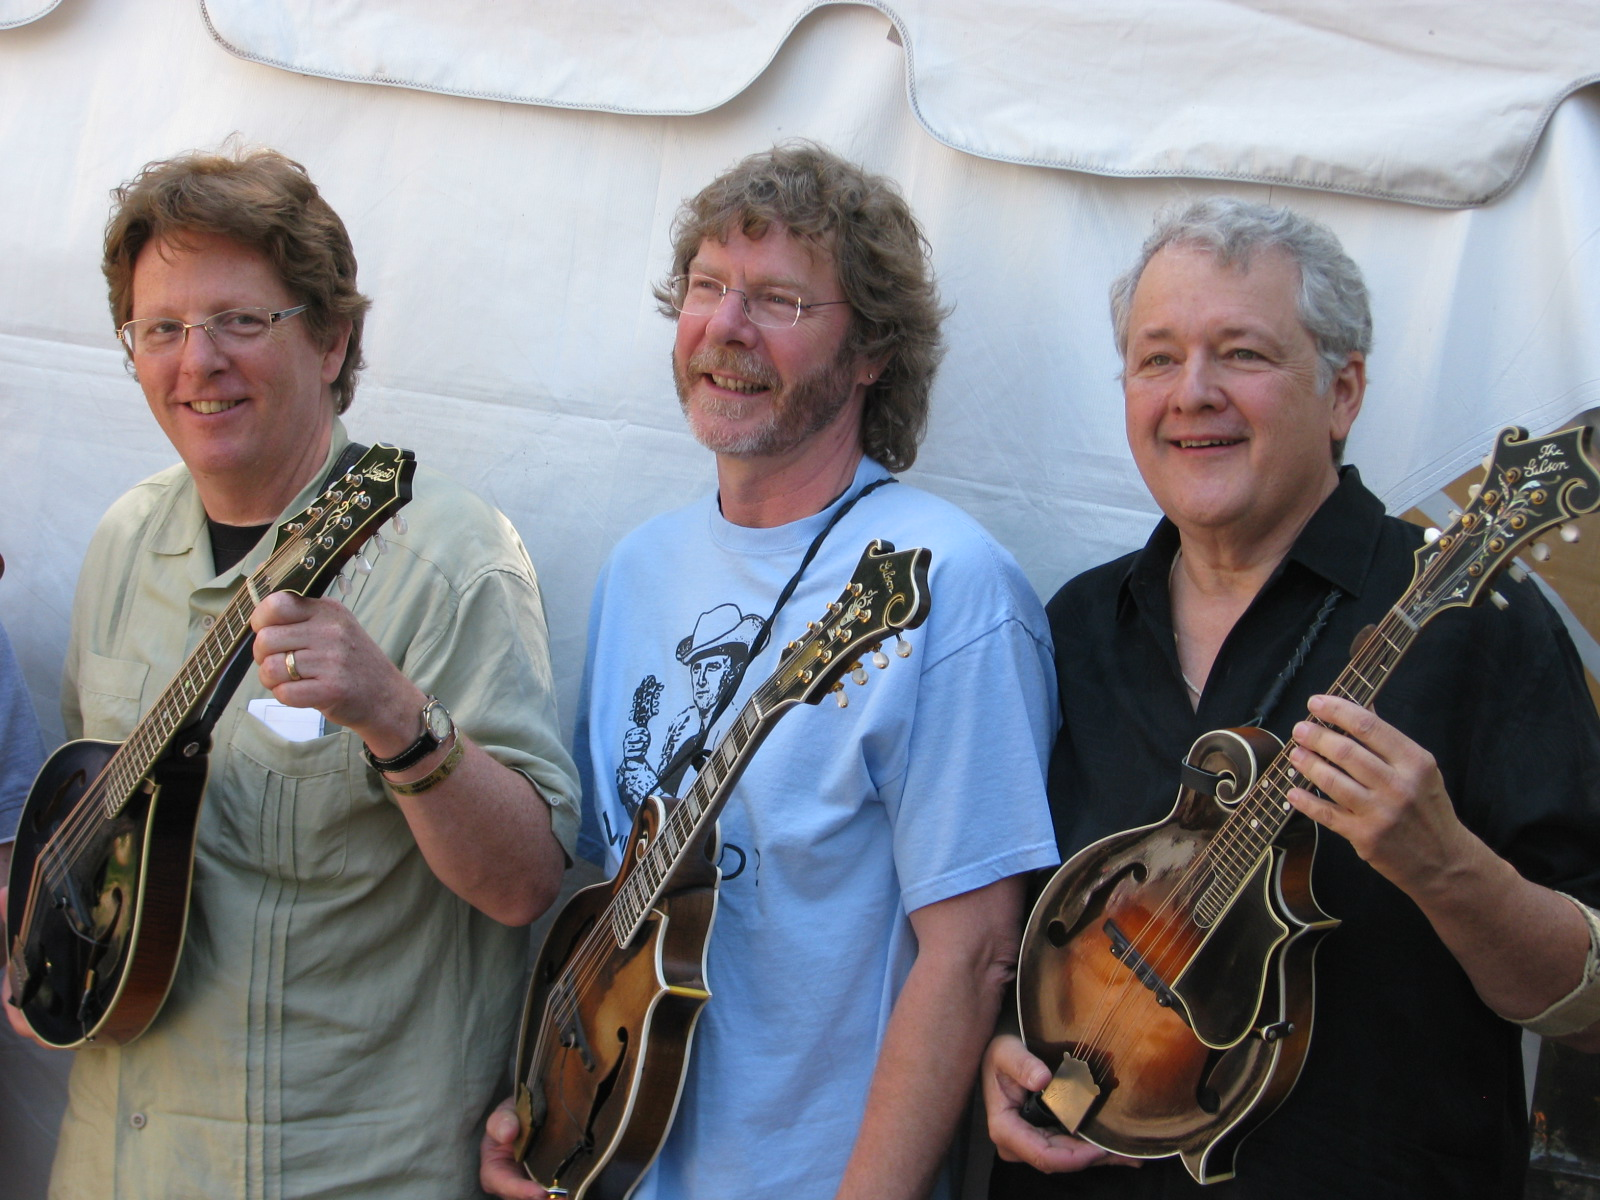 Tim O'Brien , Sam Bush & Tony Williamson Mandomania 2011 at  Merlefest! ! (photo by Francois Galland)